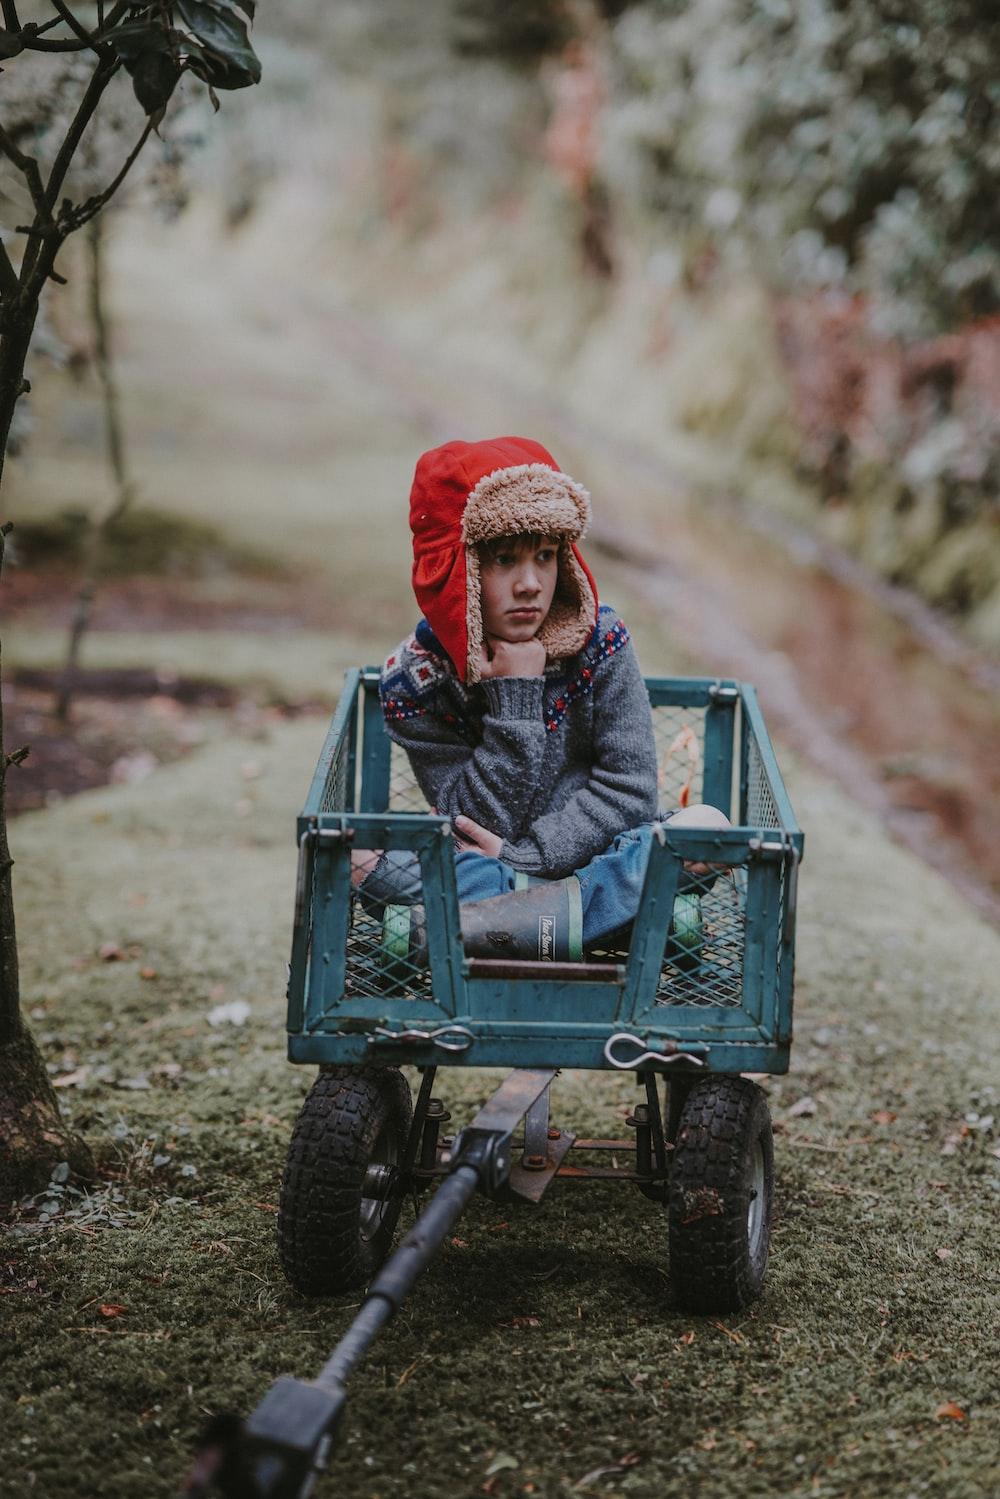 girl riding on utility trailer